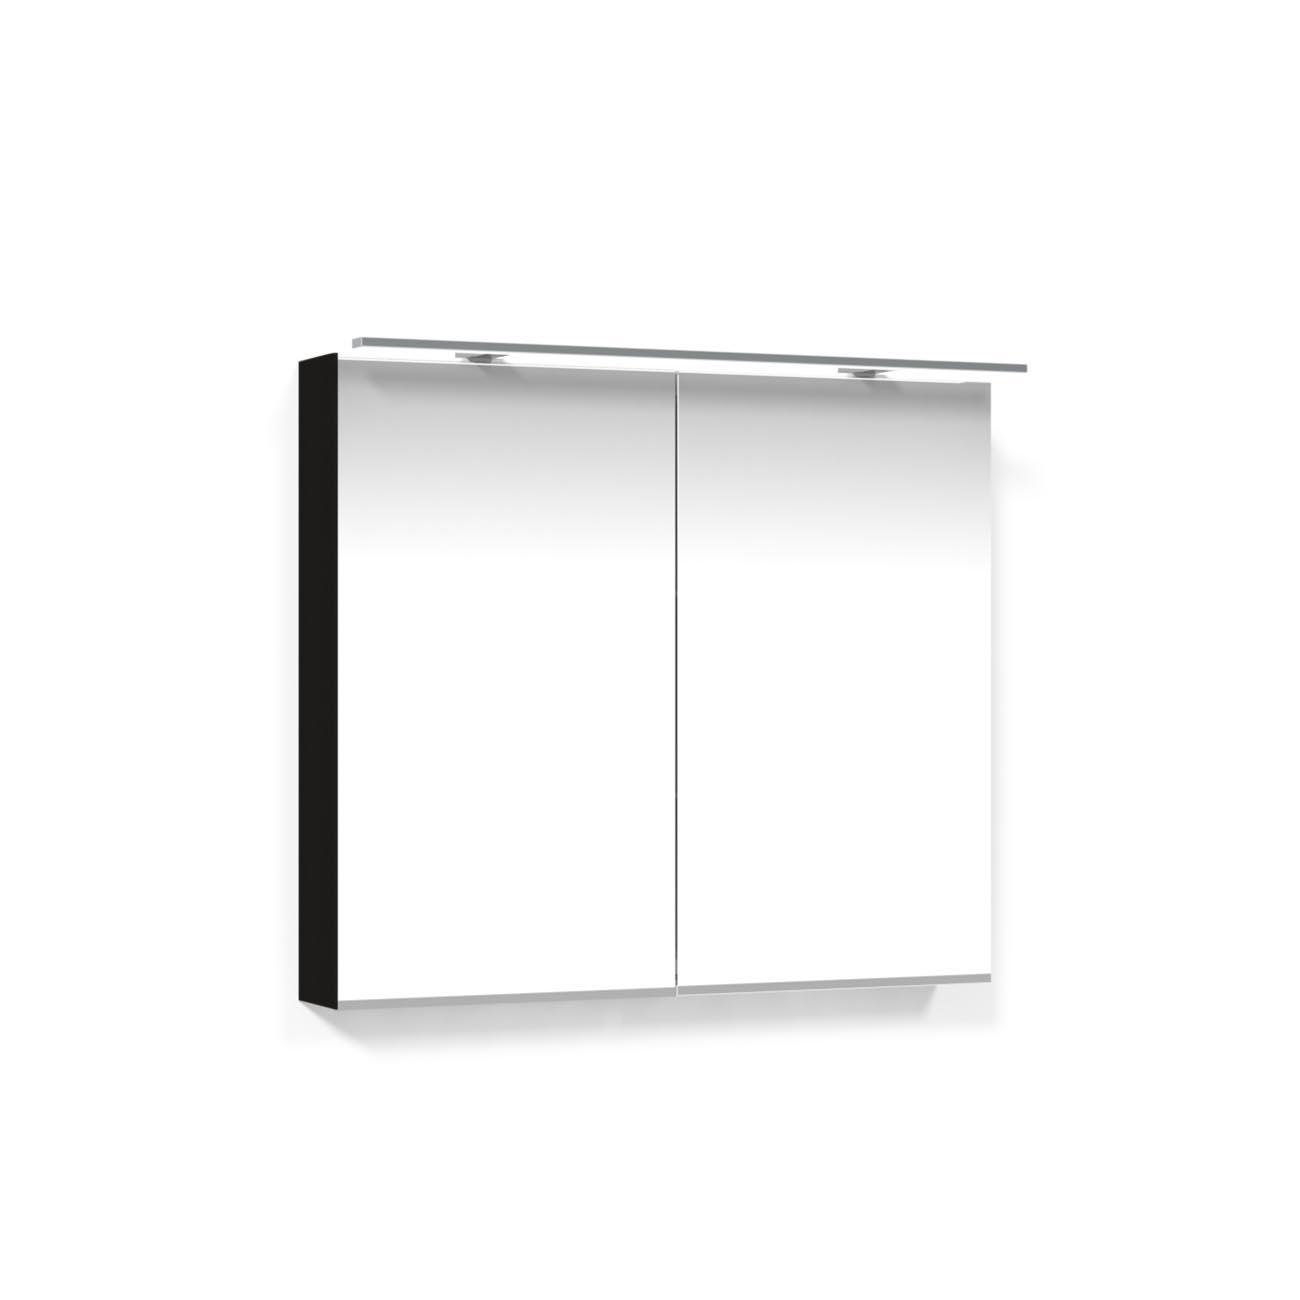 Spegelskåp Macro Design 800 Rampbelysning LED